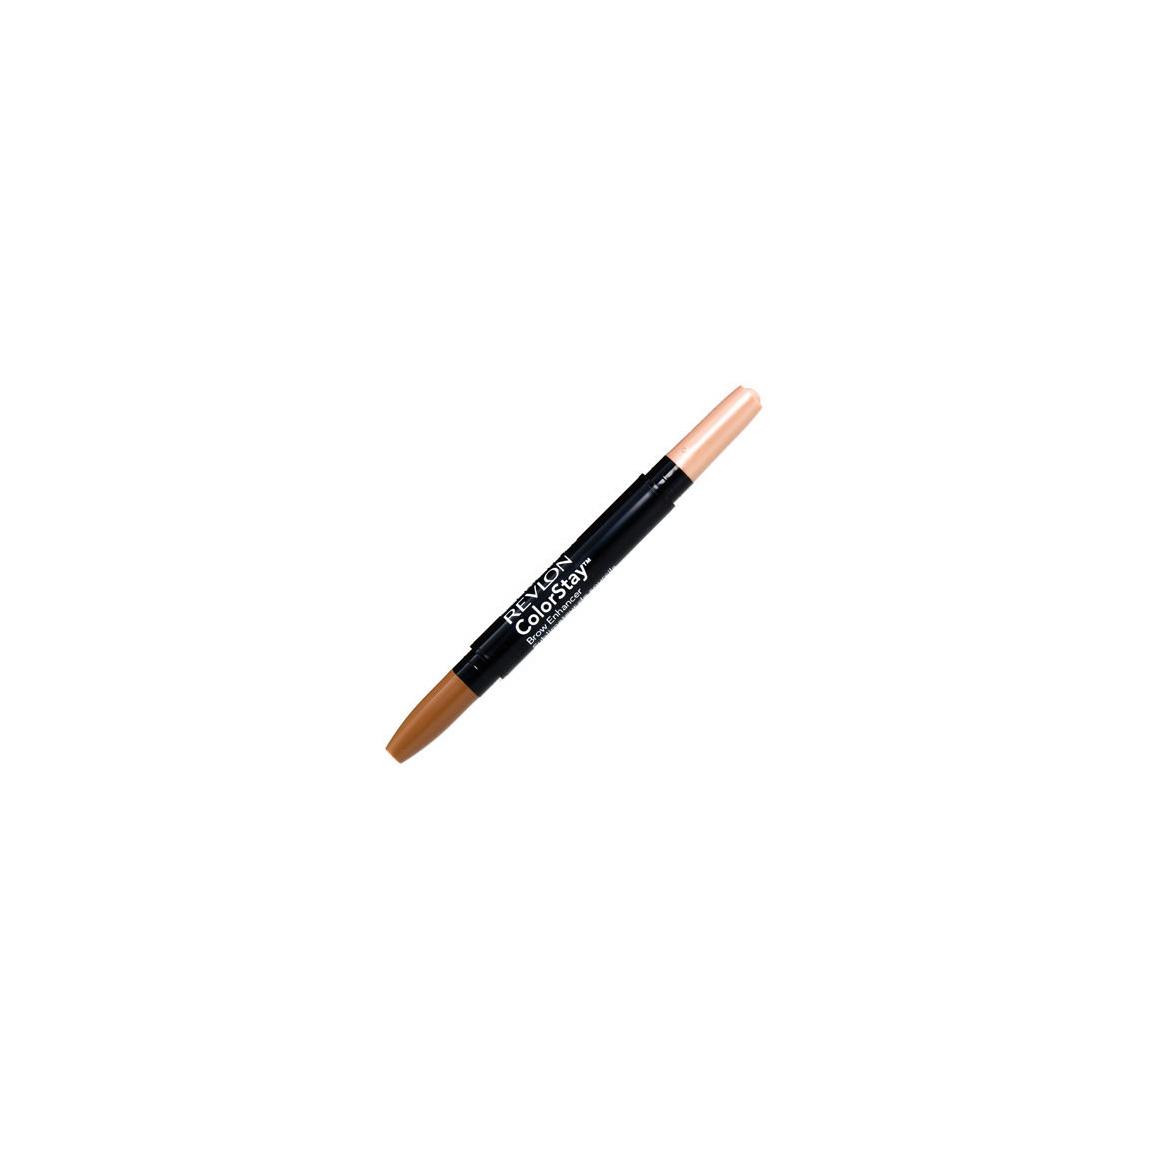 Revlon Colorstay Brow Enhancer Light Brownchampagne Beautylish